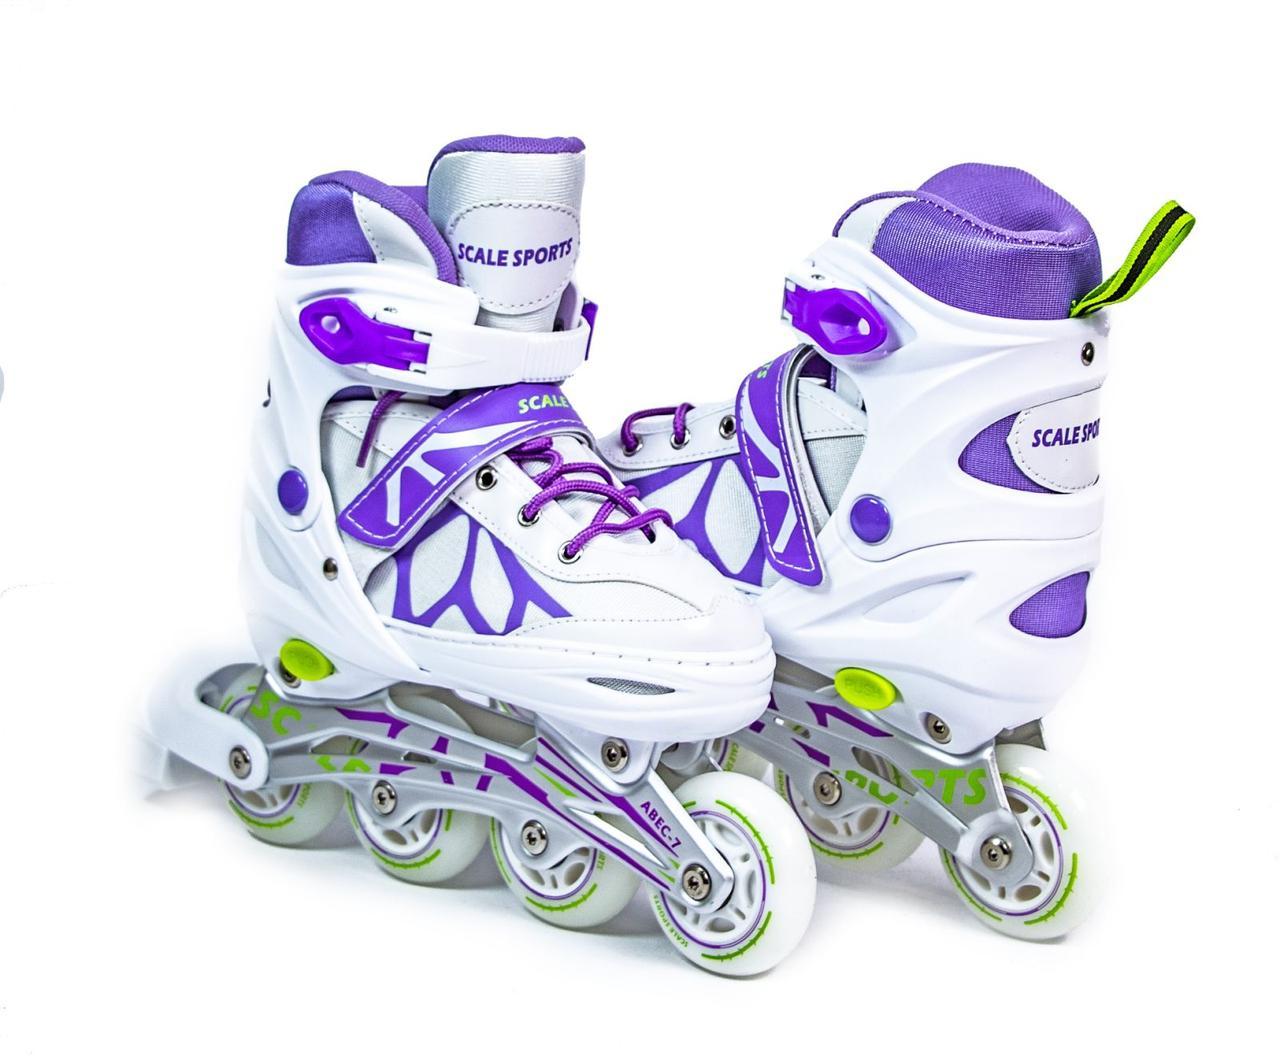 Ролики Scale Sports LF 601A бело-фиолетовые, размер 34-37